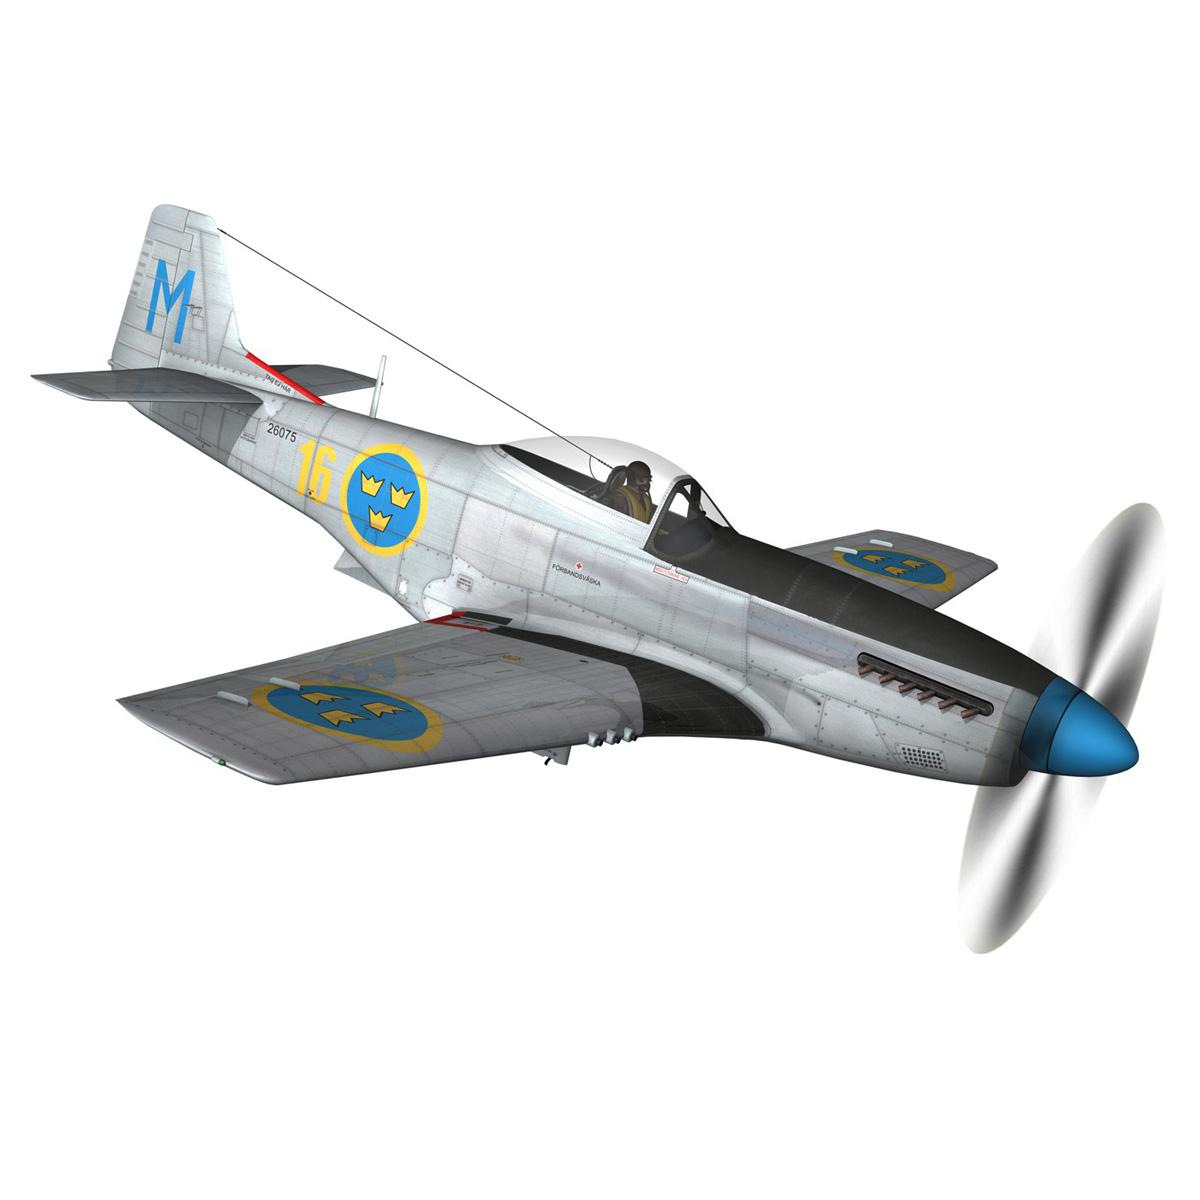 north american p-51d mustang – swedisch airforce 3d model fbx c4d lwo obj 268232